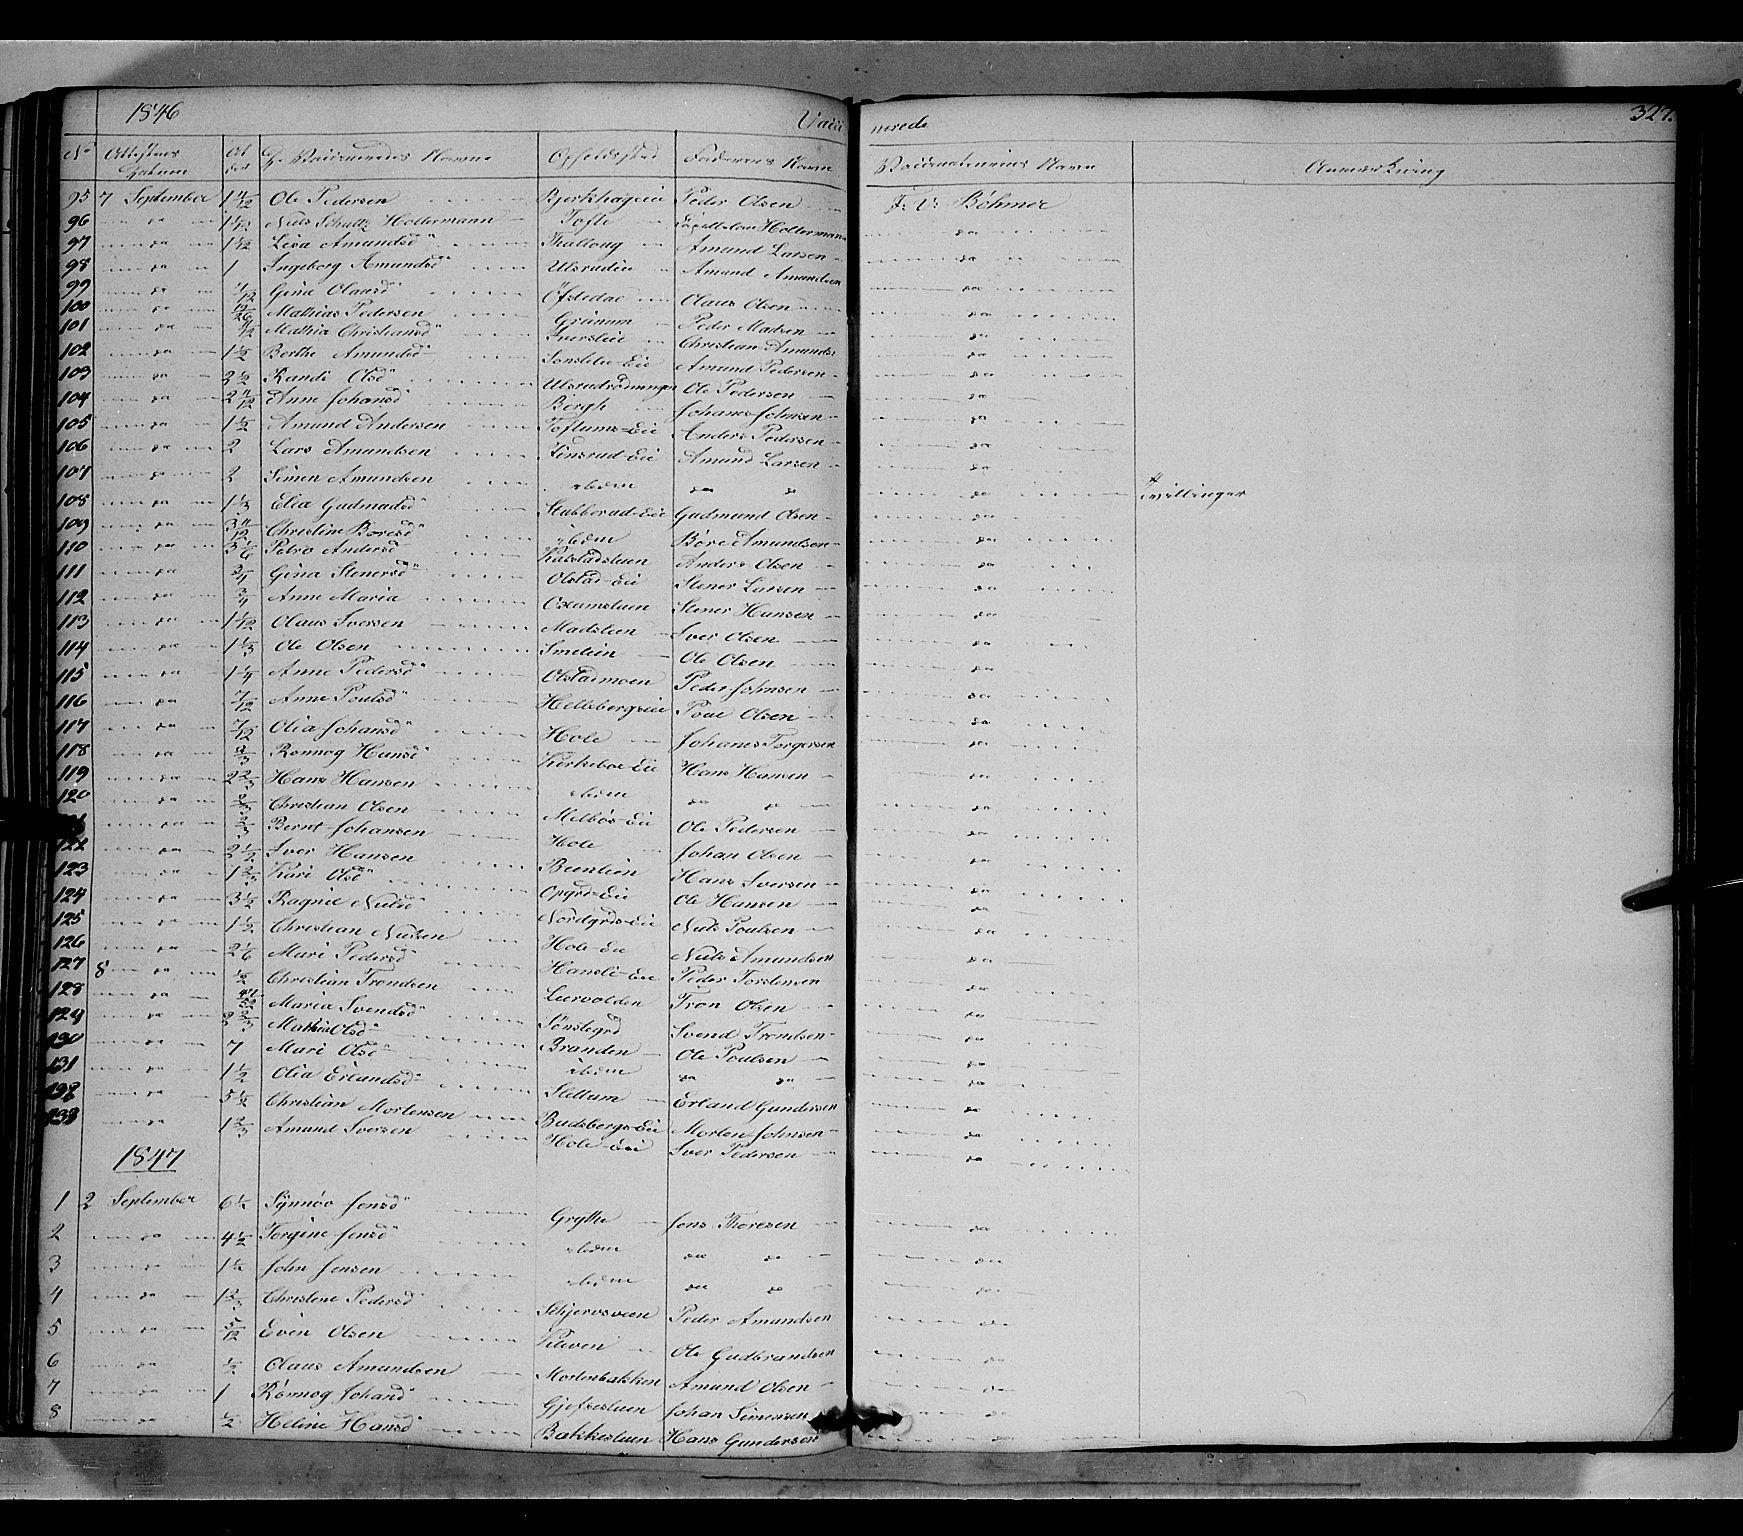 SAH, Gausdal prestekontor, Ministerialbok nr. 7, 1840-1850, s. 327